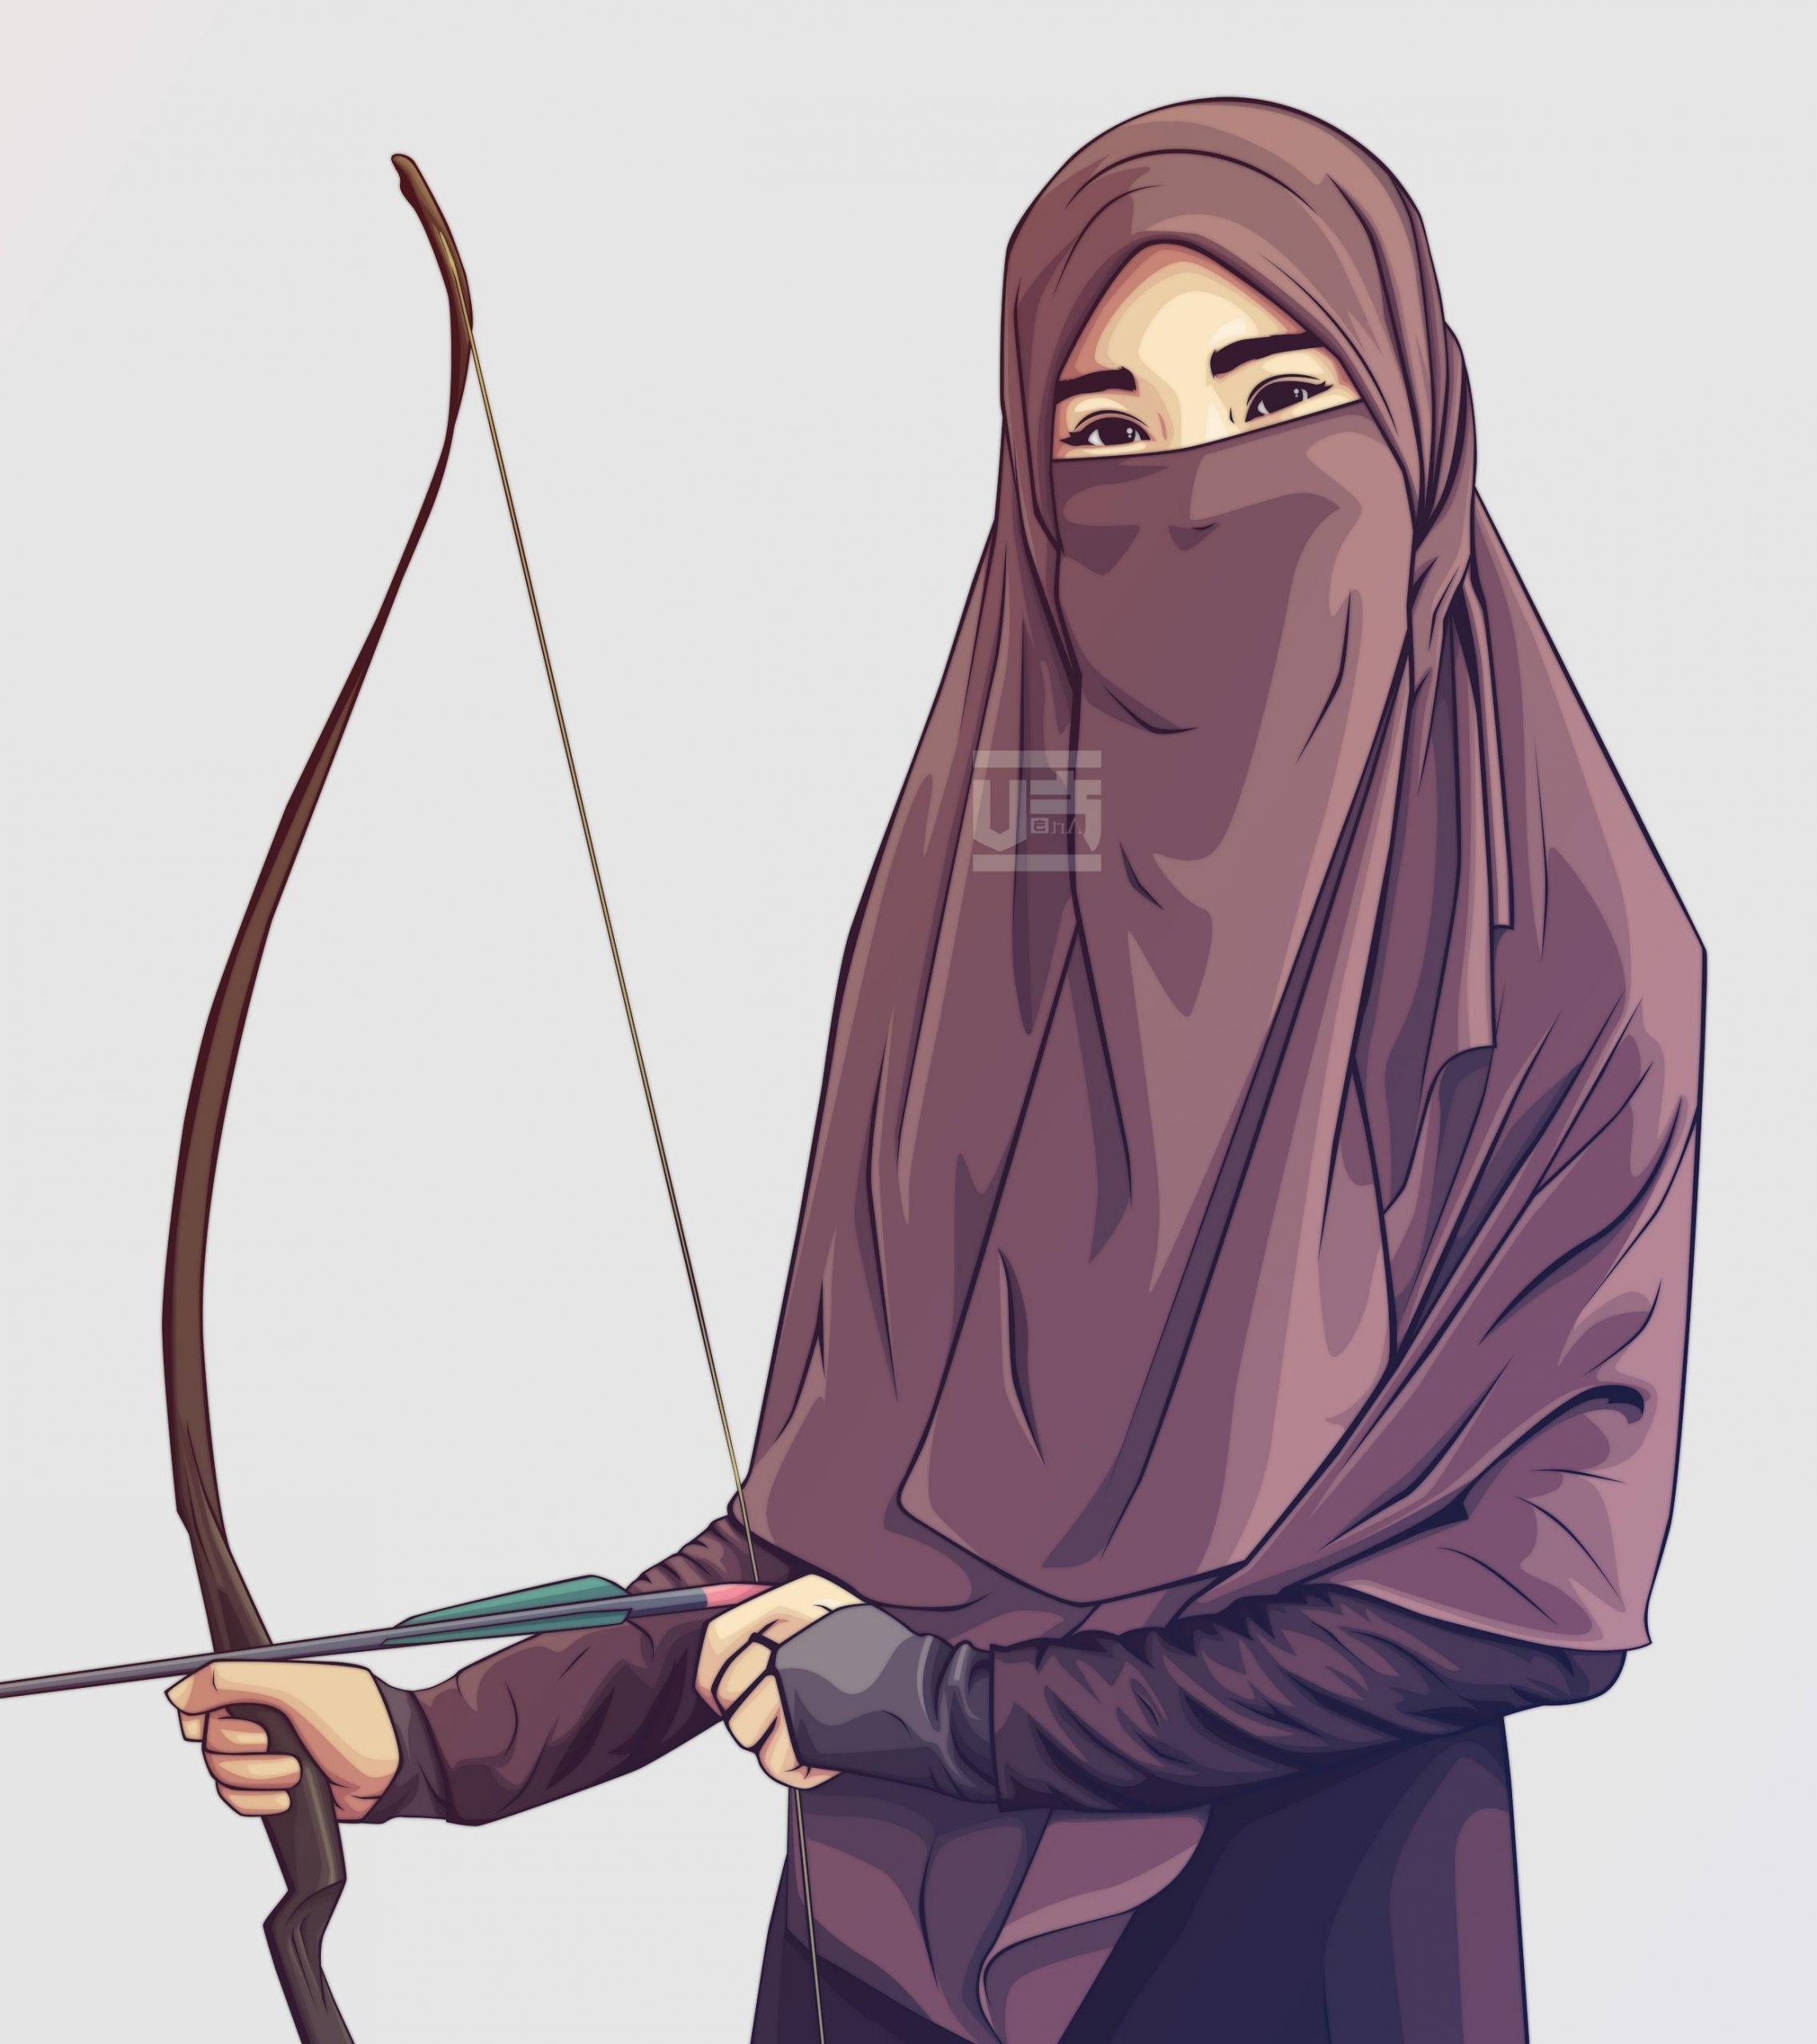 Design Muslimah Bercadar Kartun O2d5 top Gambar Kartun Muslimah Pakai Niqab